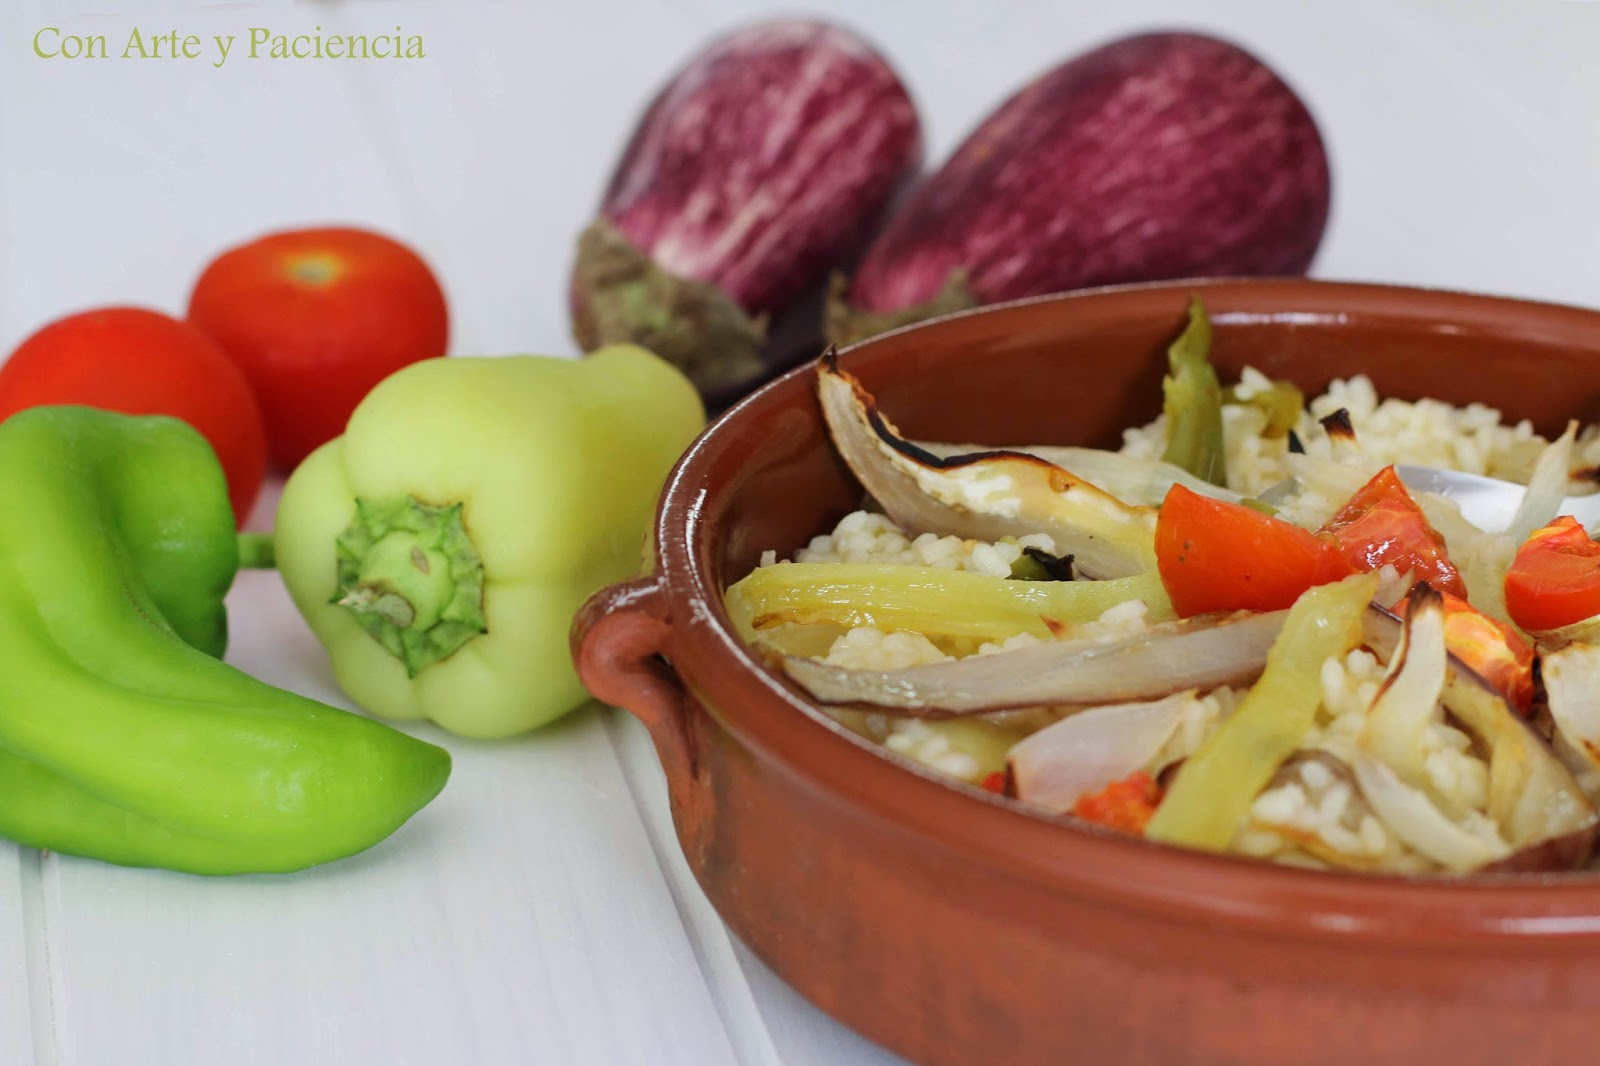 risotto,verdura,asada,queso,parmesano,receta,italiana,casera,homemade,berengena,pimiento,cebolla,tomate,aceite,oliva,horno,casera,